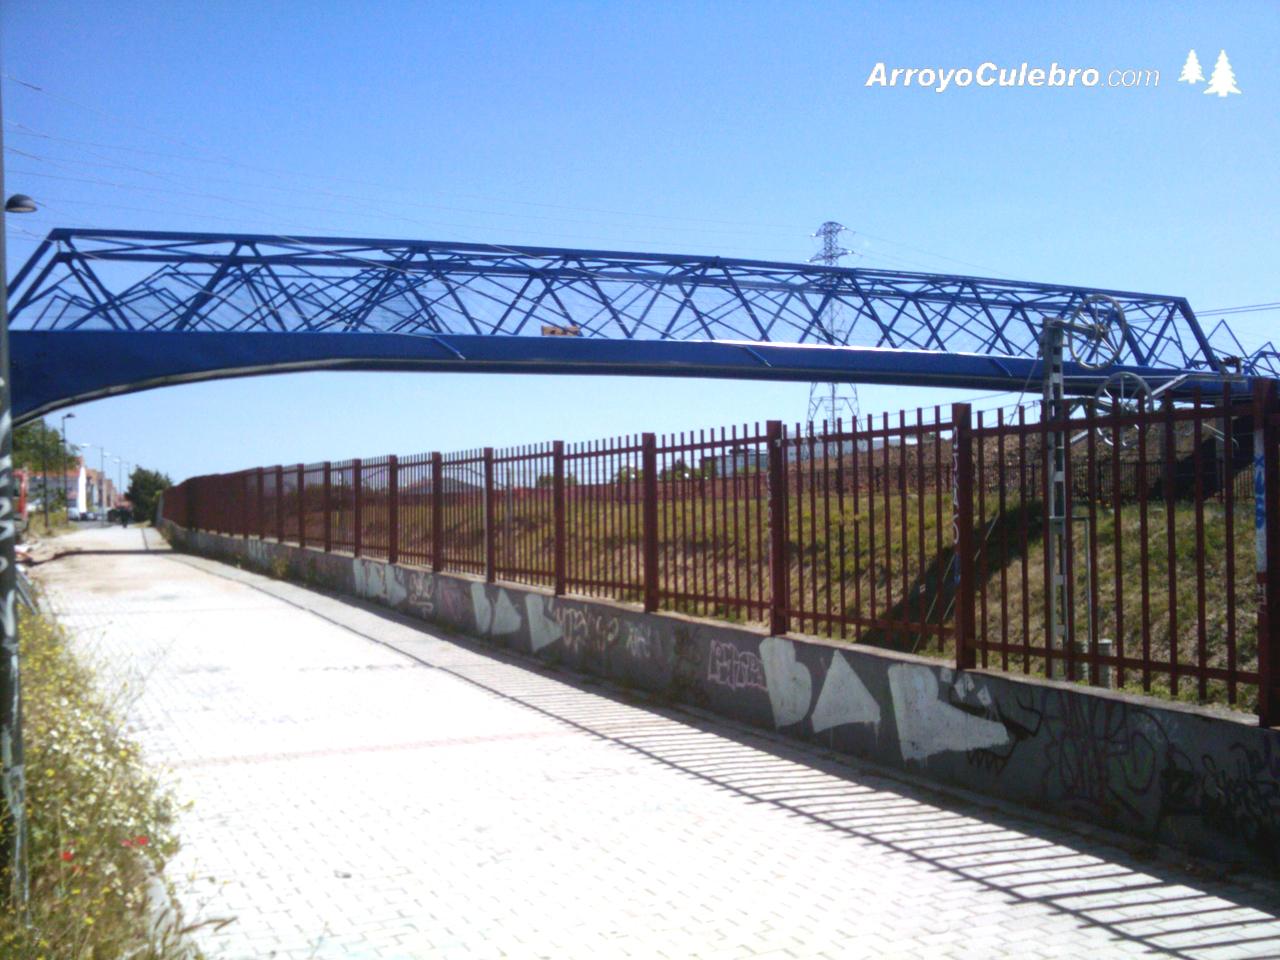 2010-05-16-puente-linea-c5-leganes